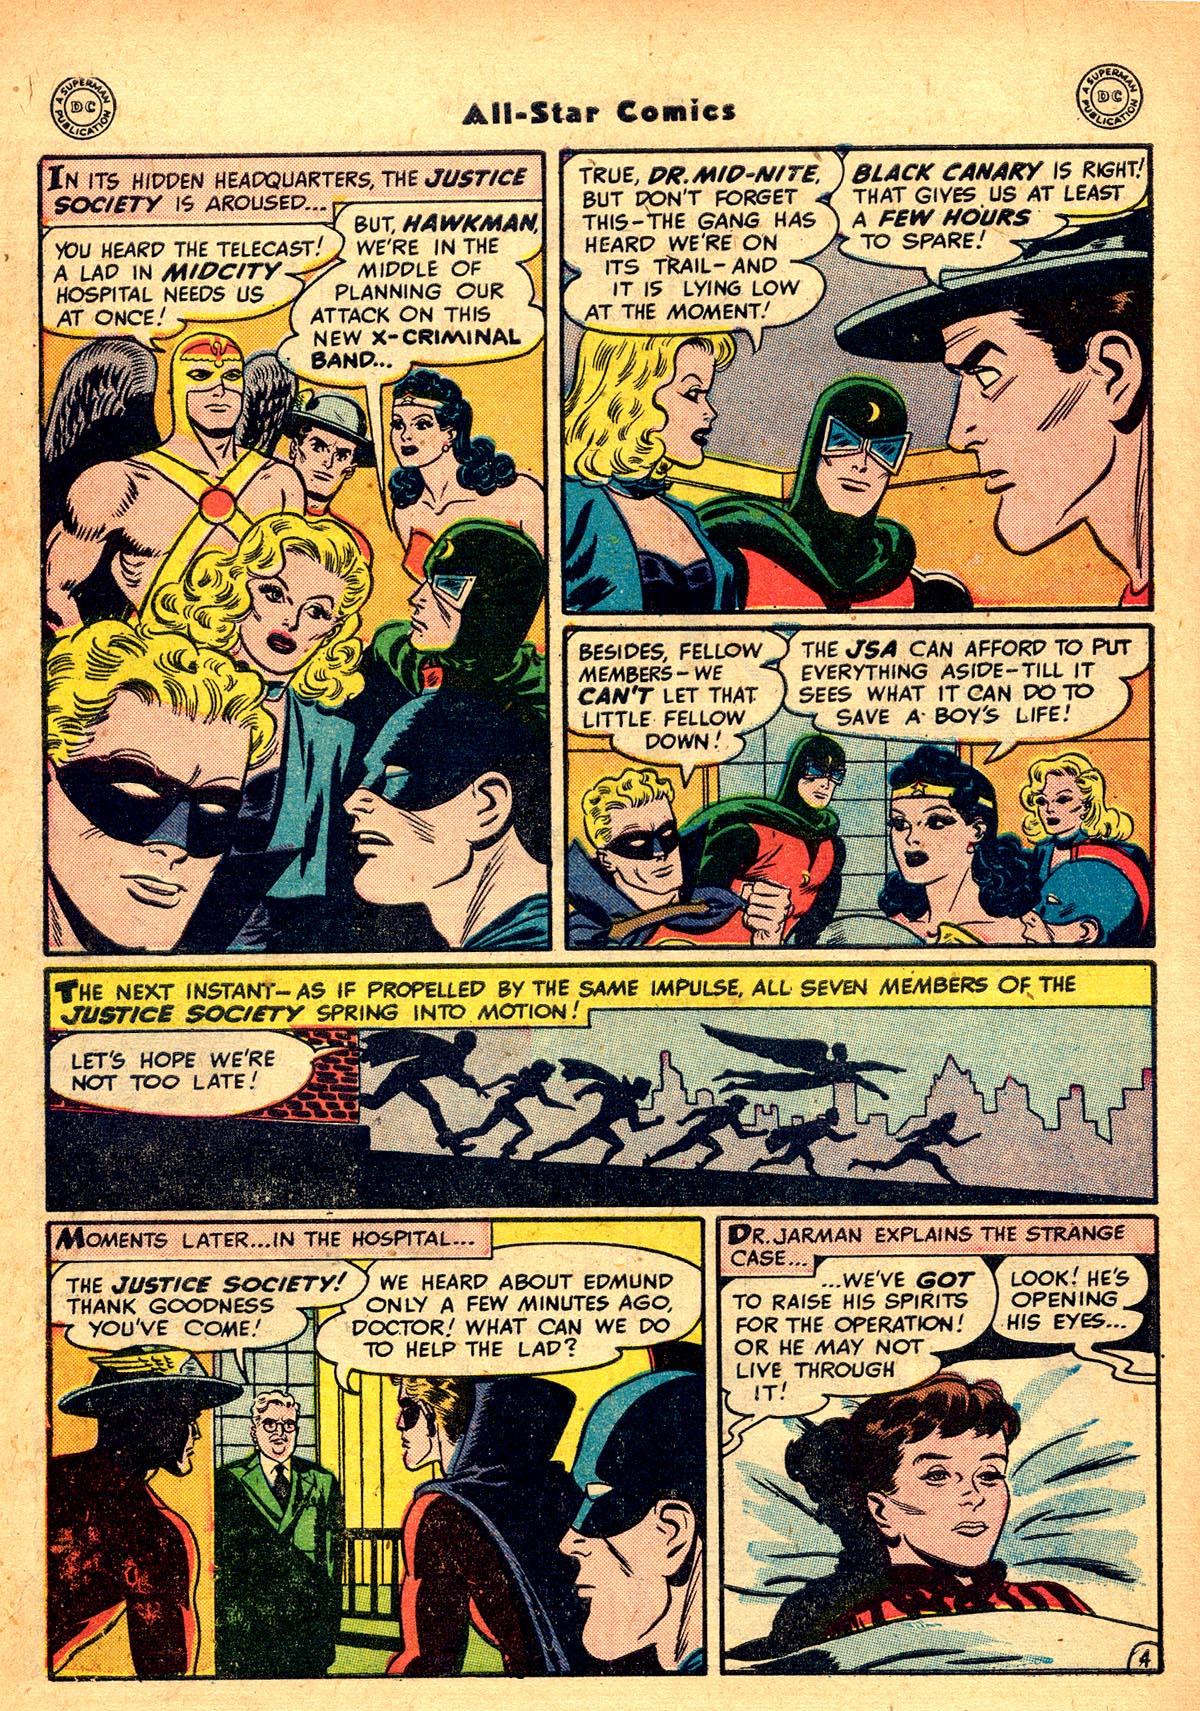 Read online All-Star Comics comic -  Issue #48 - 6